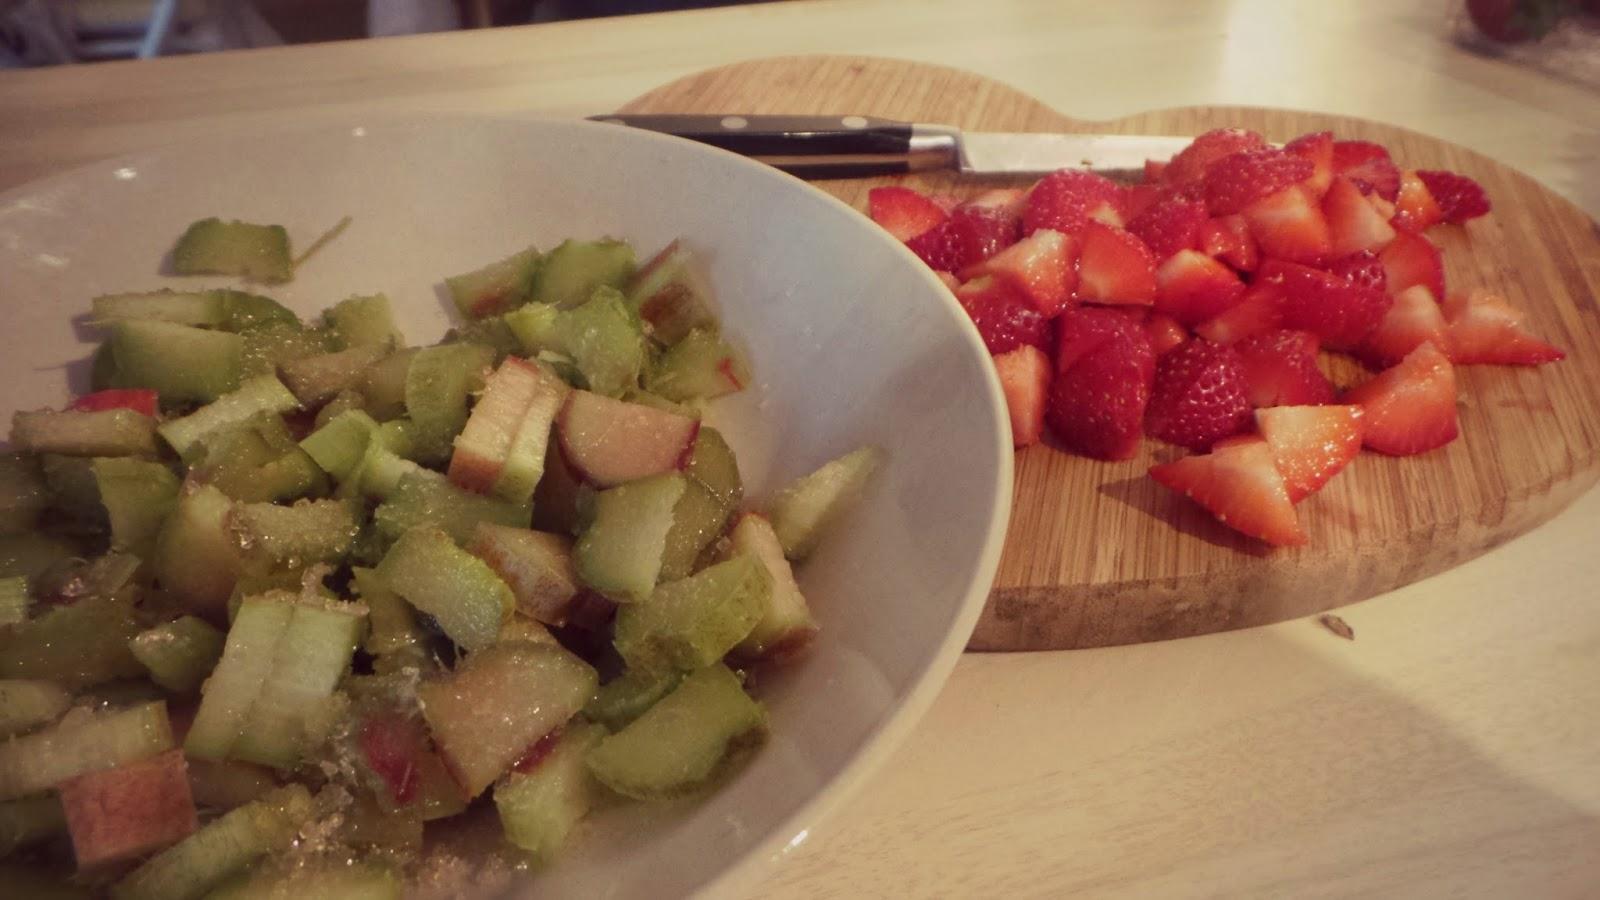 sugared rhubarb